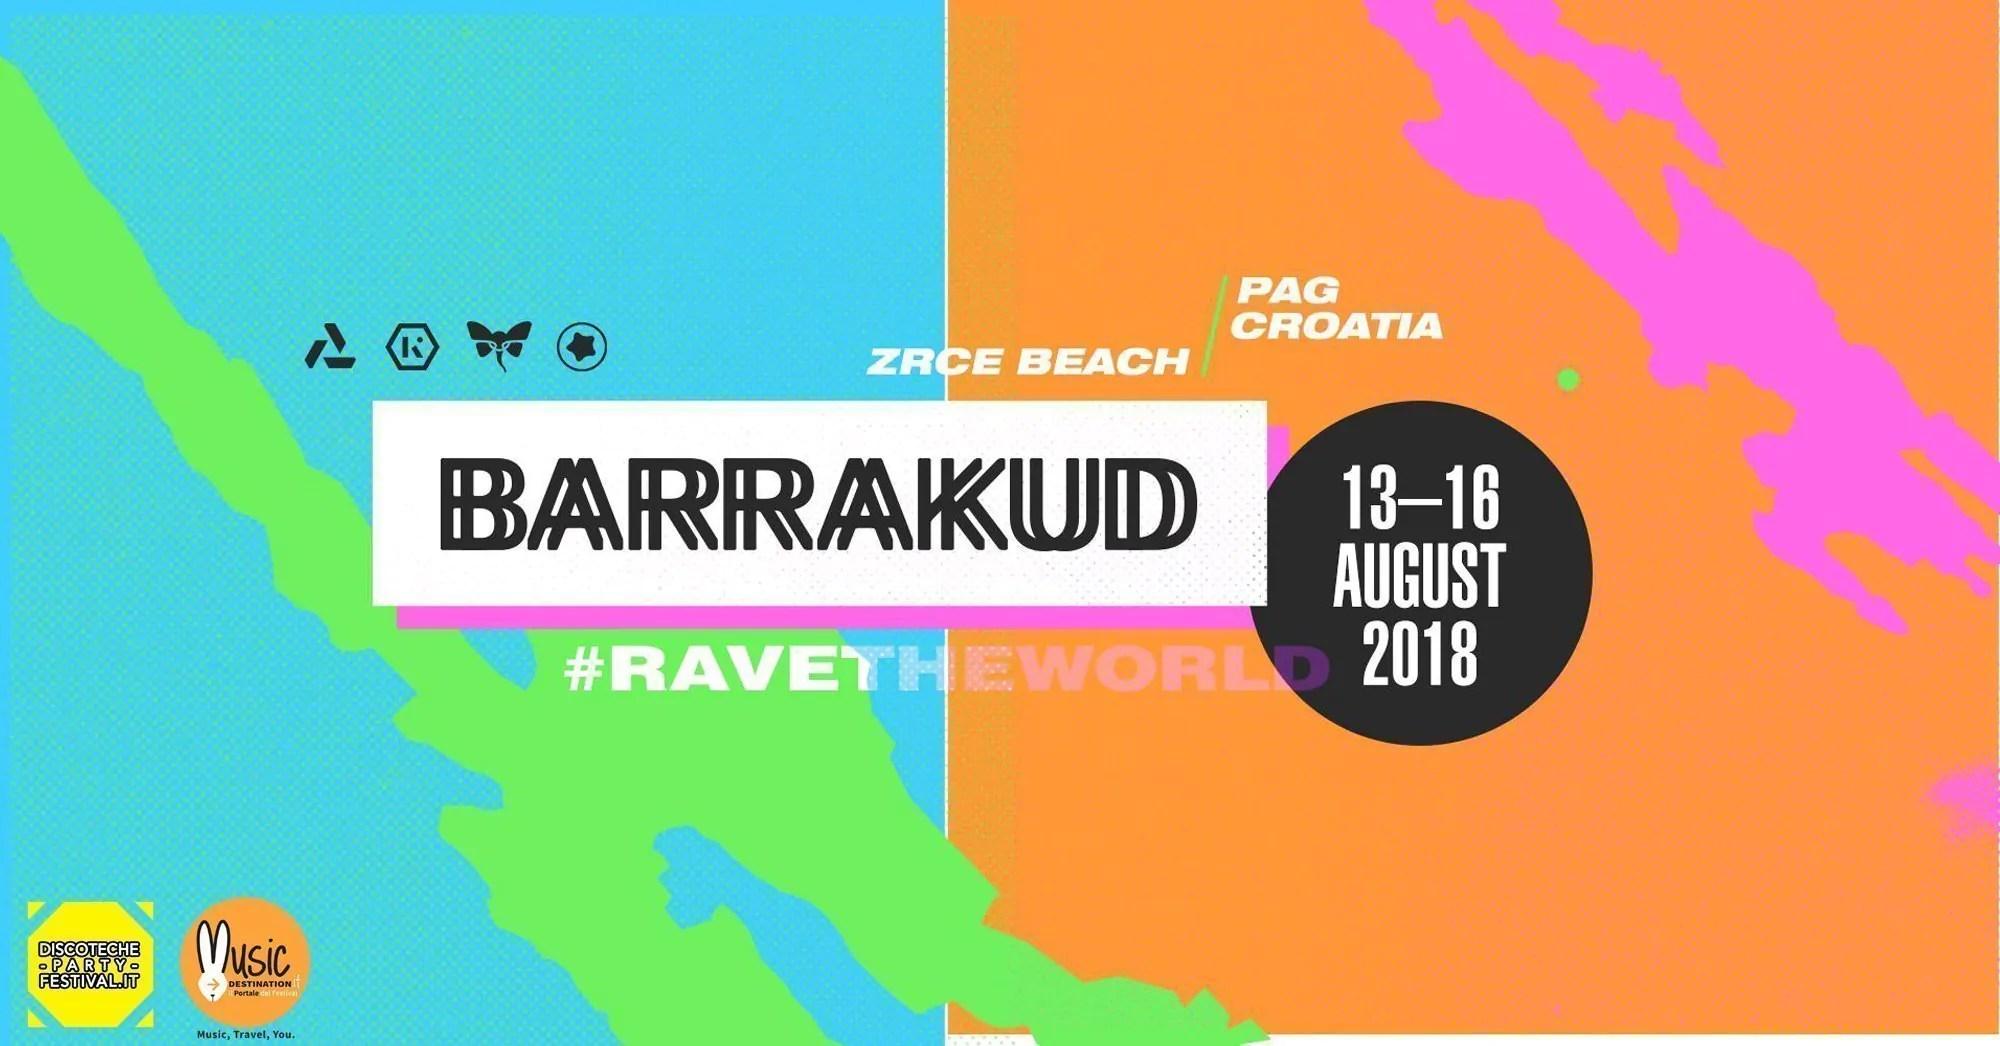 BARRAKUD Festival 2018, 13 – 16 Agosto – Pag Croazia – Ticket – Appartamento